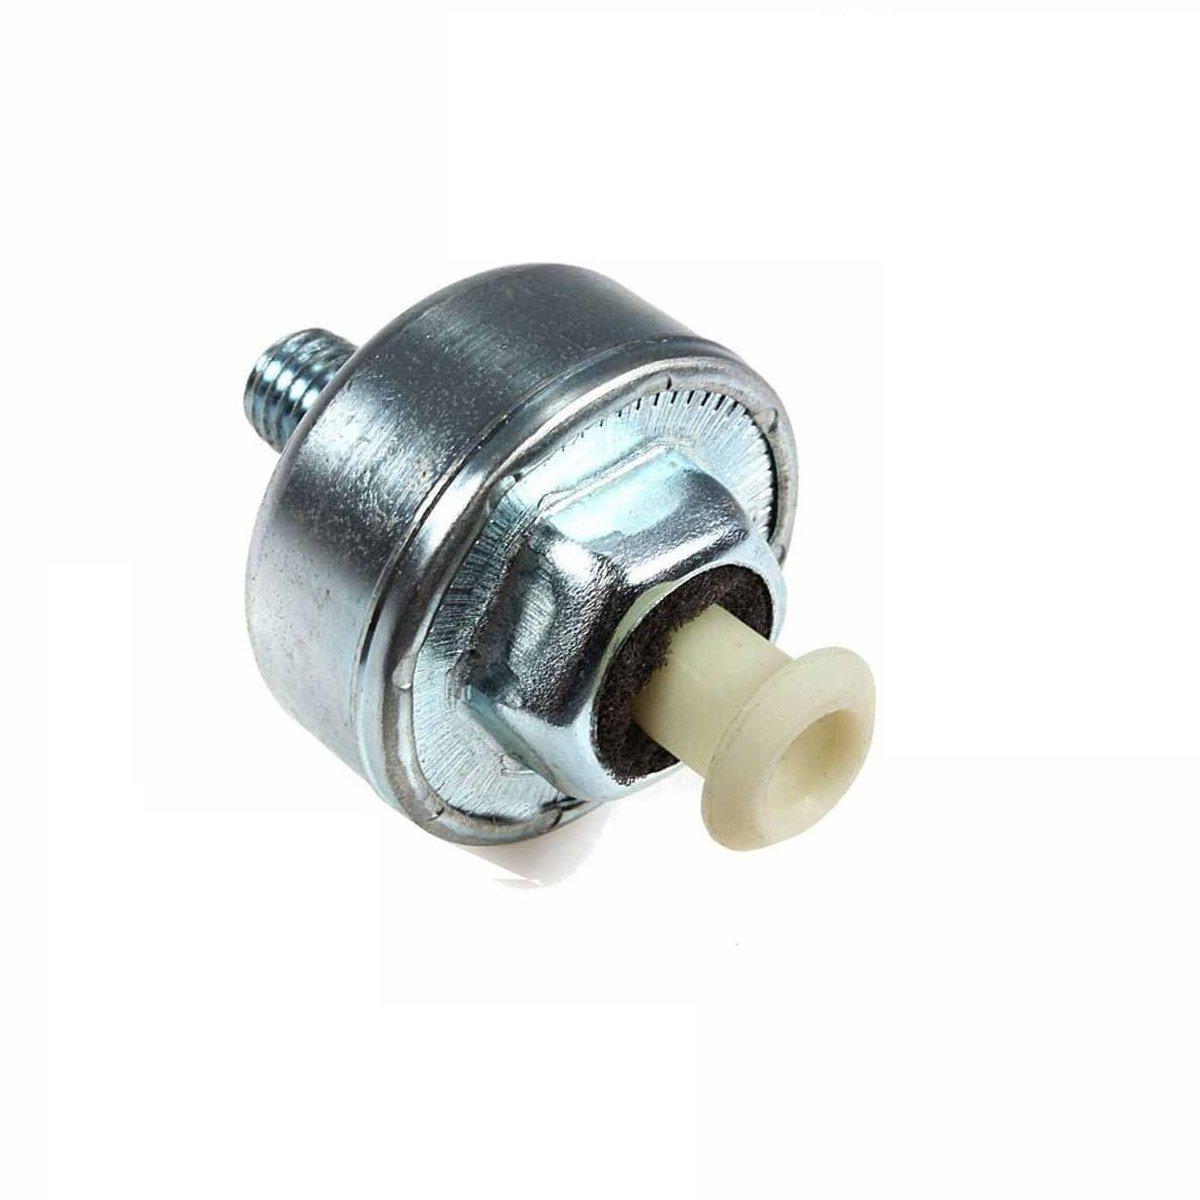 JahyShow 10456603 AS10017 Ignition Knock Detonation Sensor For GM 213-3521